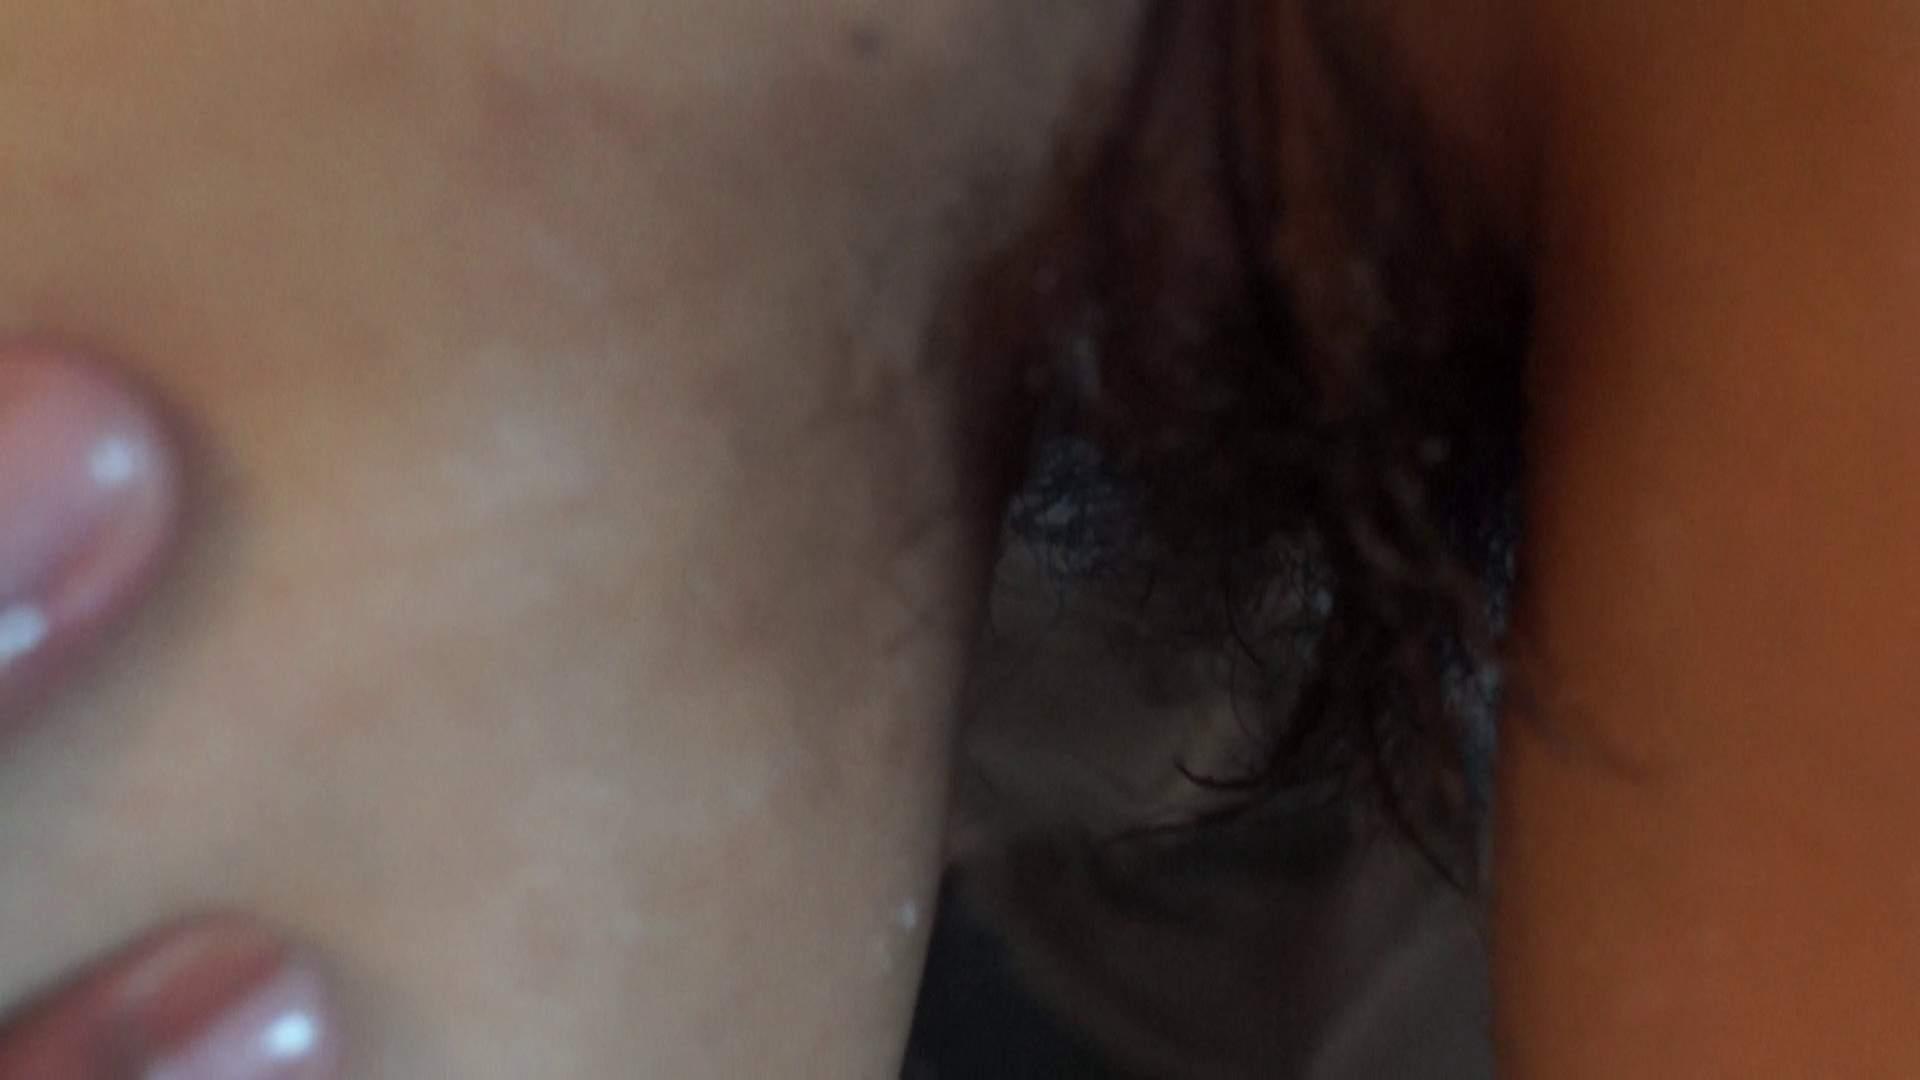 vol.12 留華ちゃん背中が性感帯ですね。 顔出しNG一般女性  103pic 92